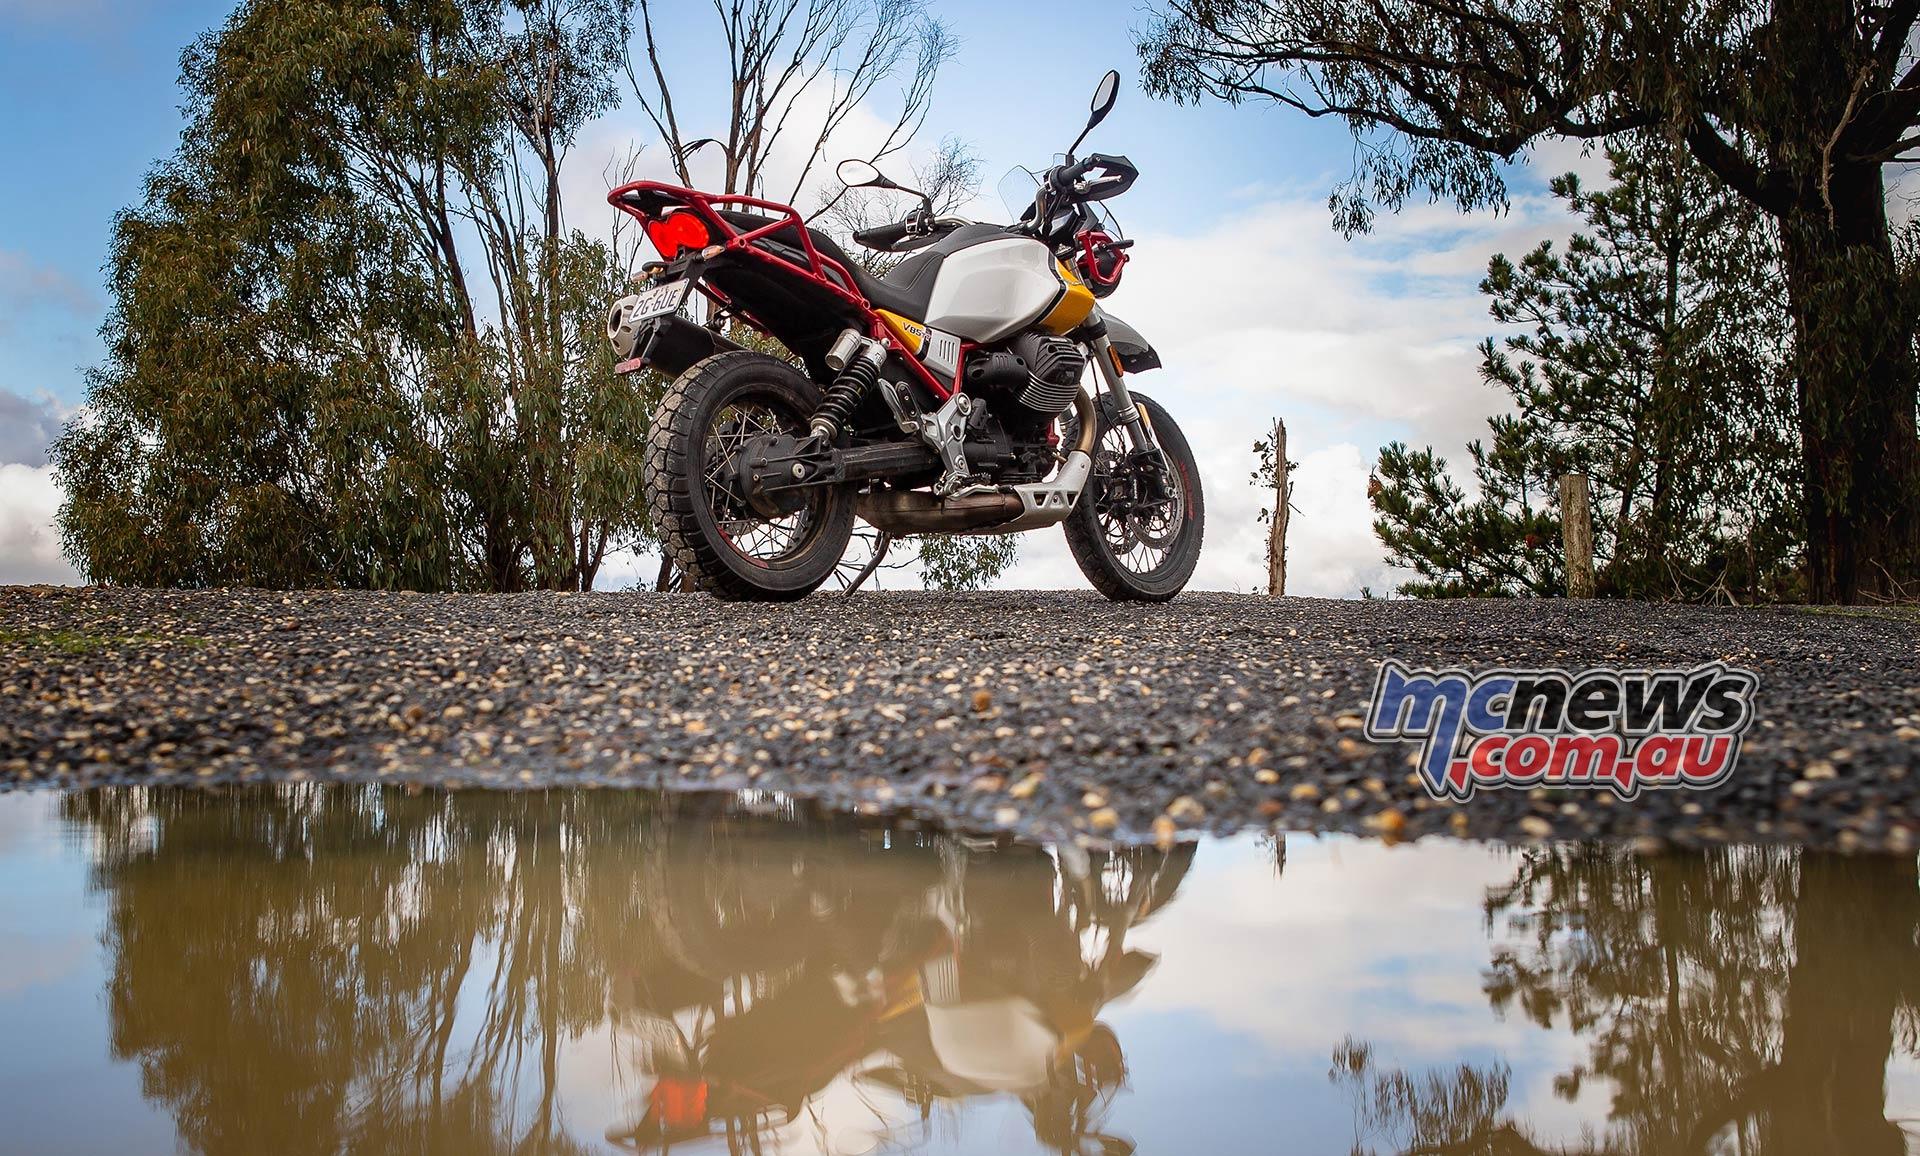 Moto Guzzi V85 TT Review | Motorcycle Tests | MCNews com au